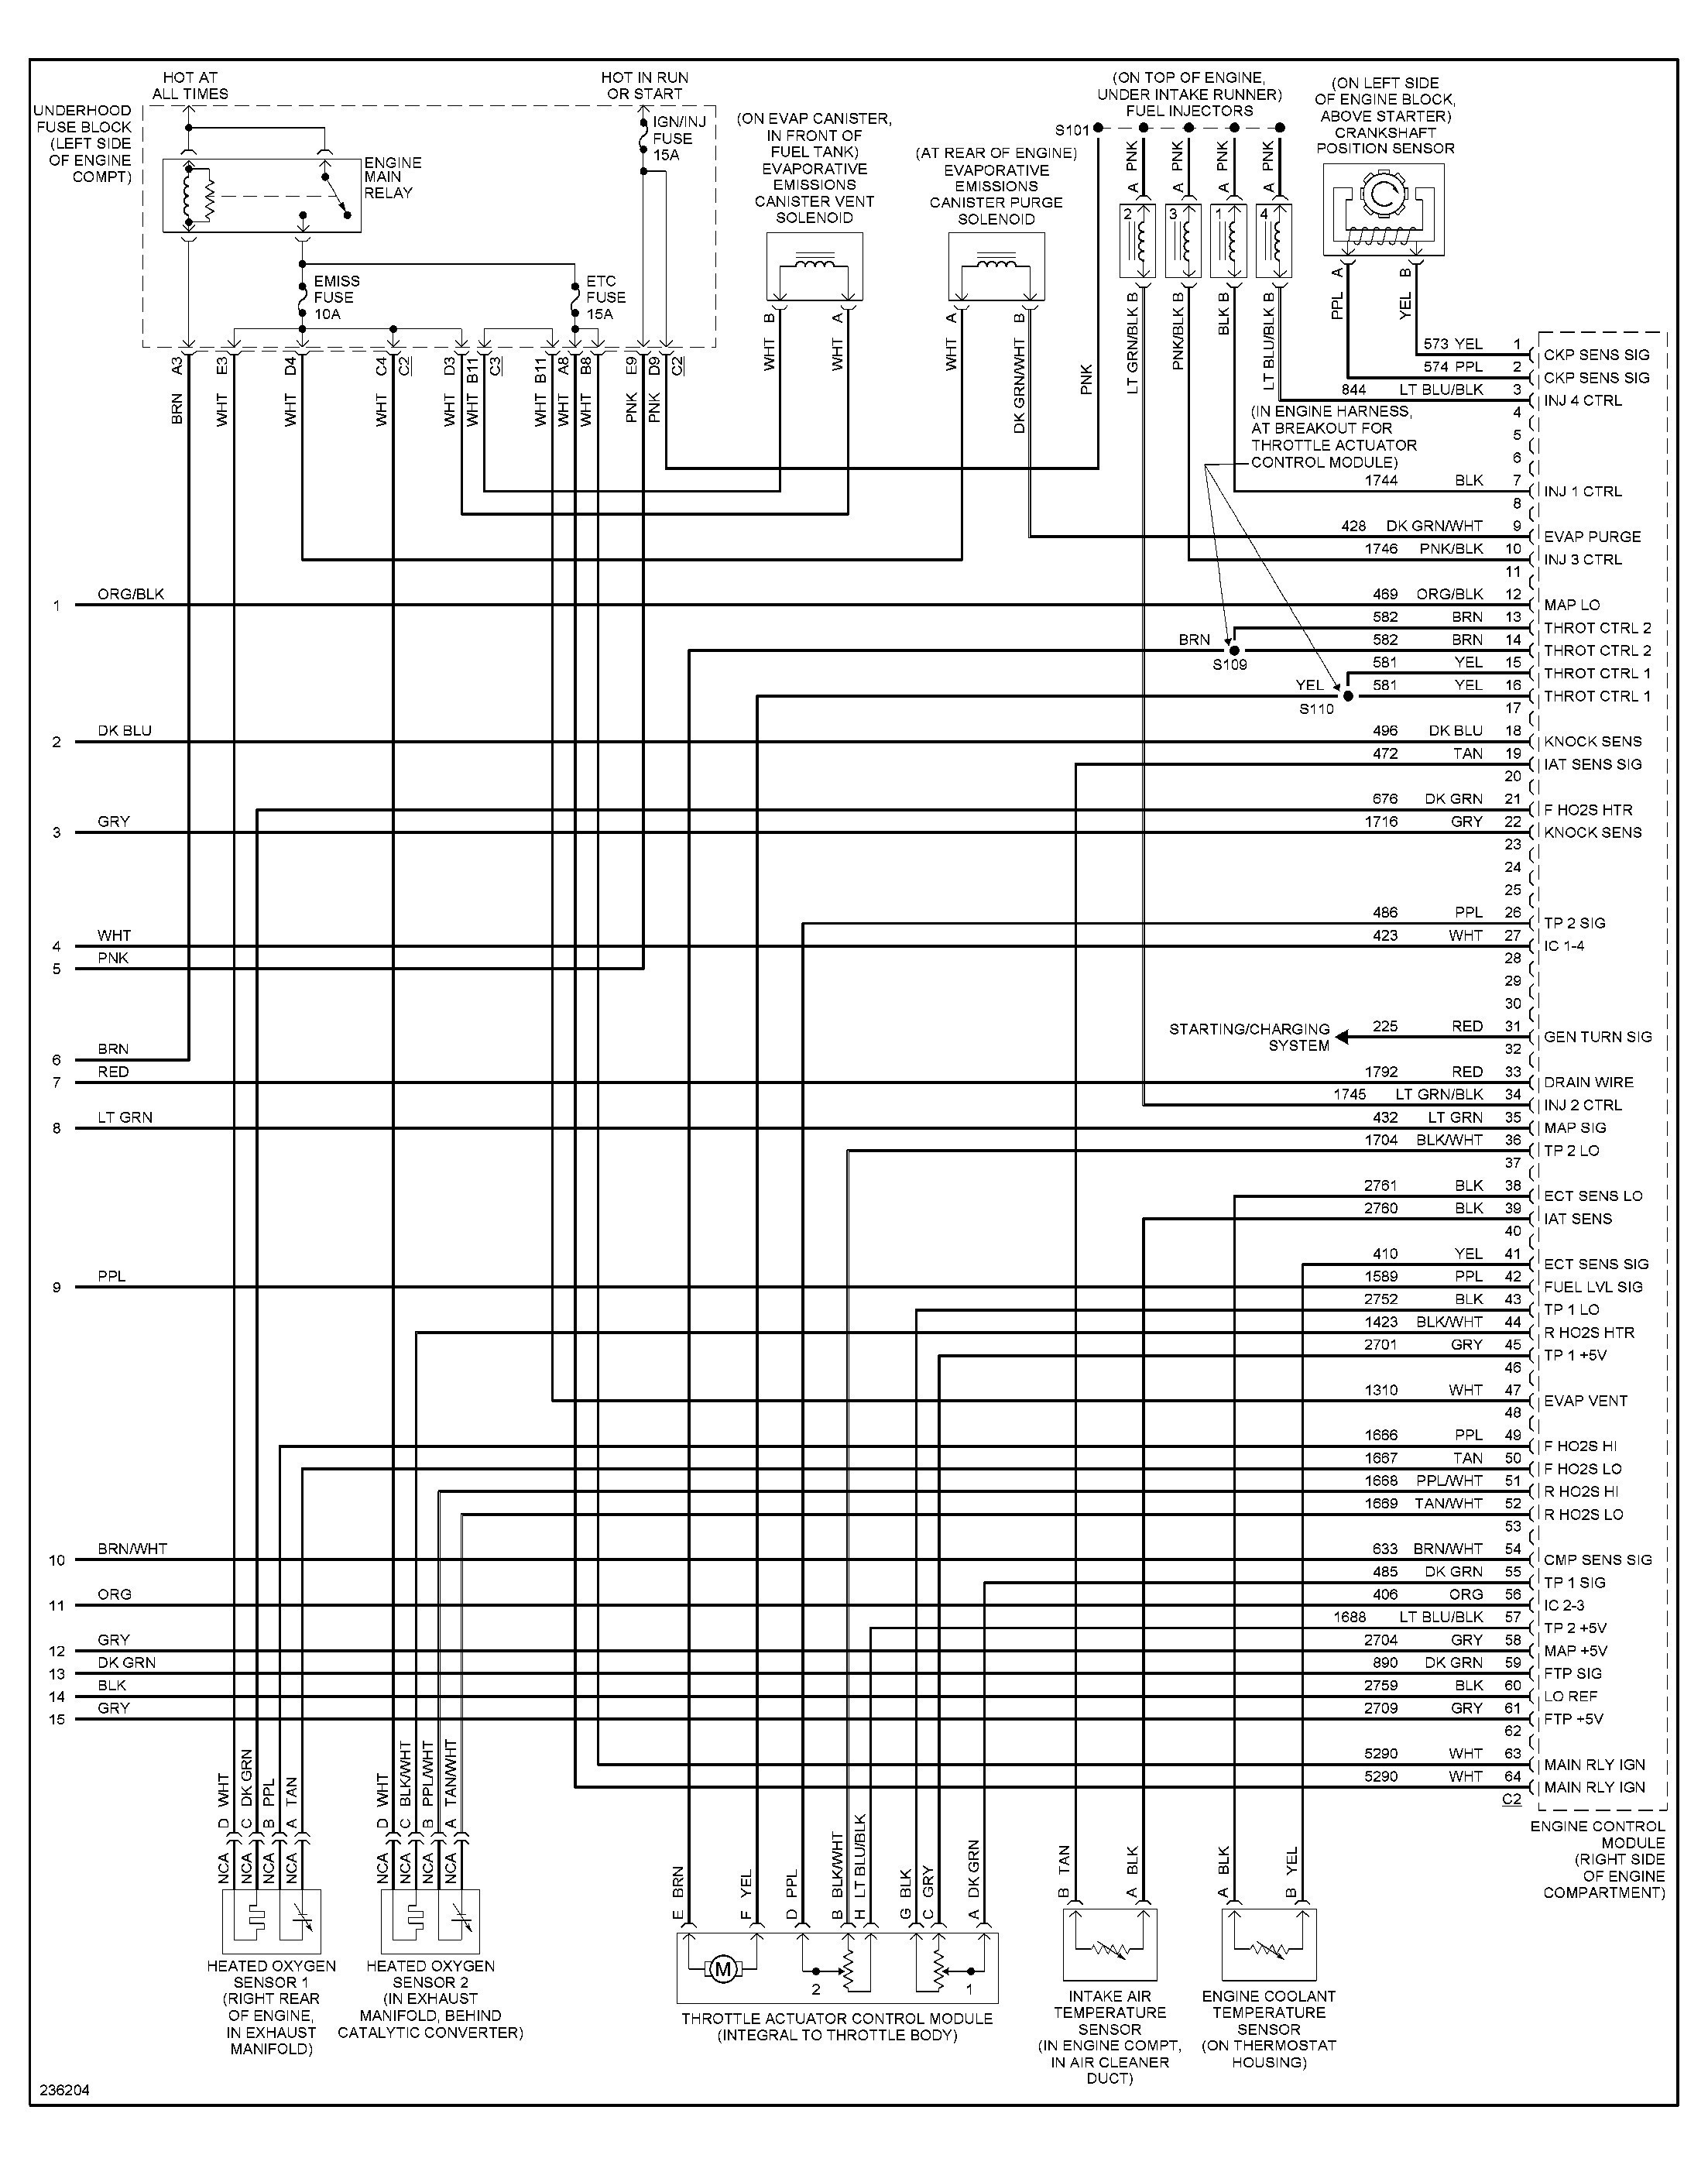 2004 Saturn Ion Engine Diagram 2004 Saturn Vue Engine Diagram Worksheet and Wiring Diagram • Of 2004 Saturn Ion Engine Diagram